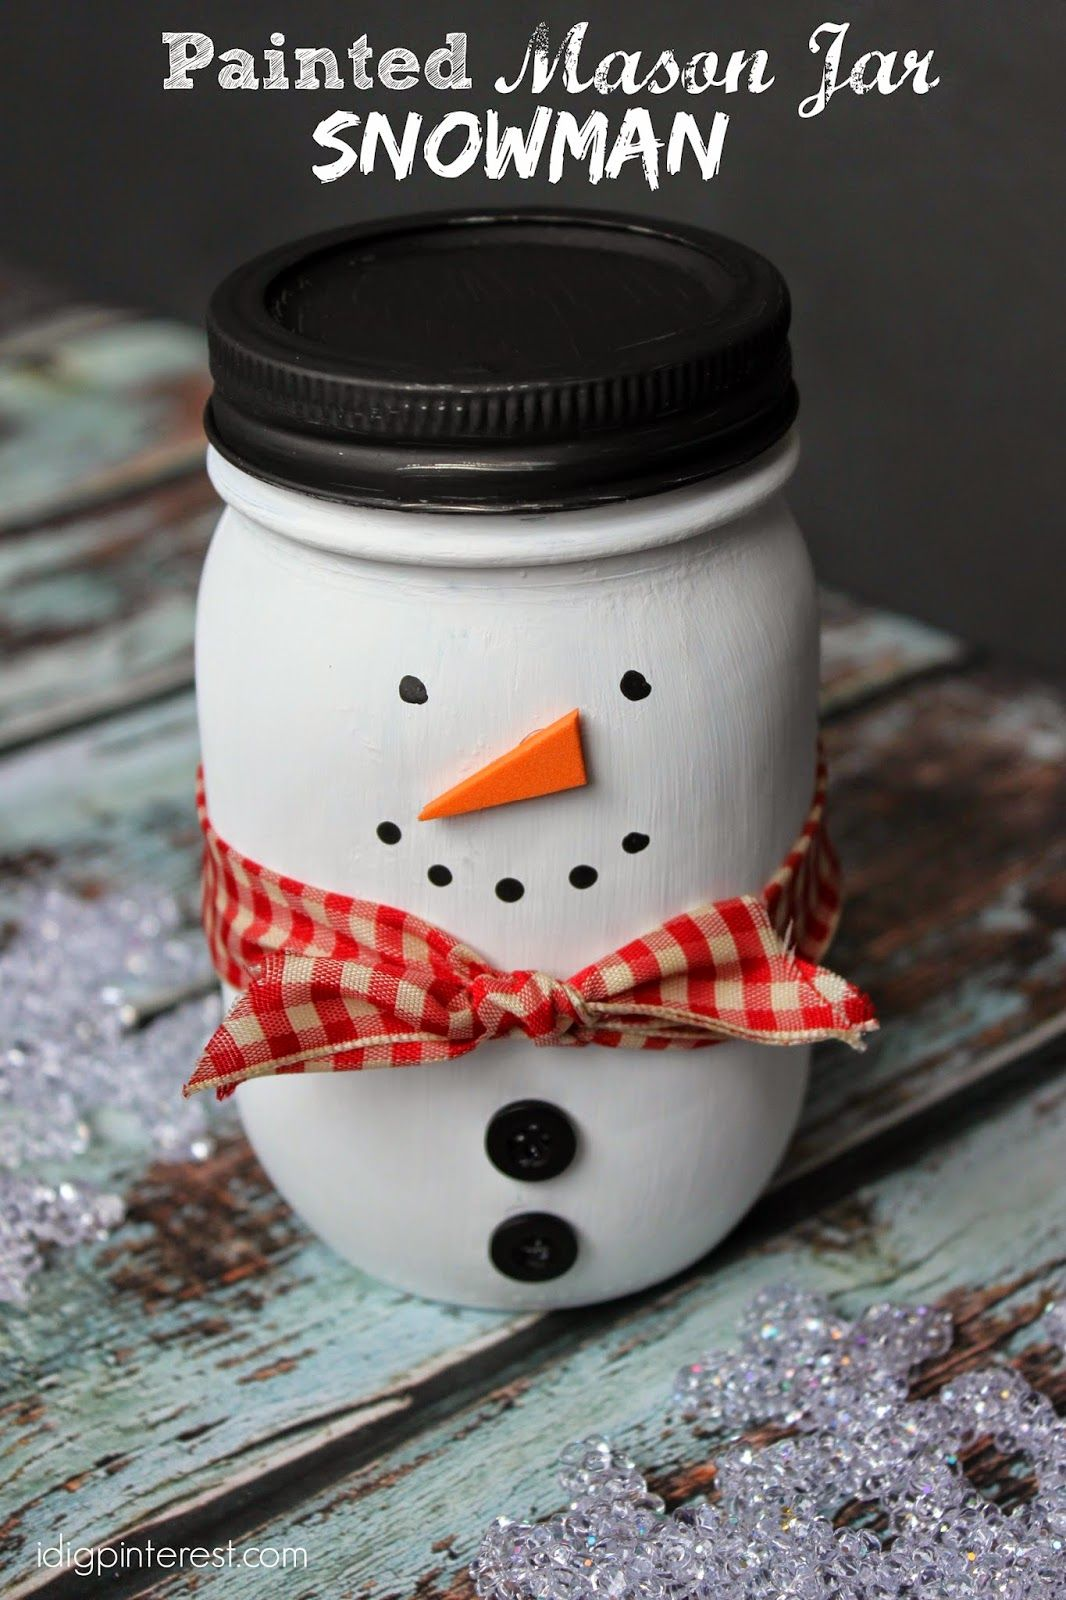 Christmas Craft Ideas Mason Jars Part - 15: CRAFT IDEAS FOR SNOW MAN MASON JARS - Google Search